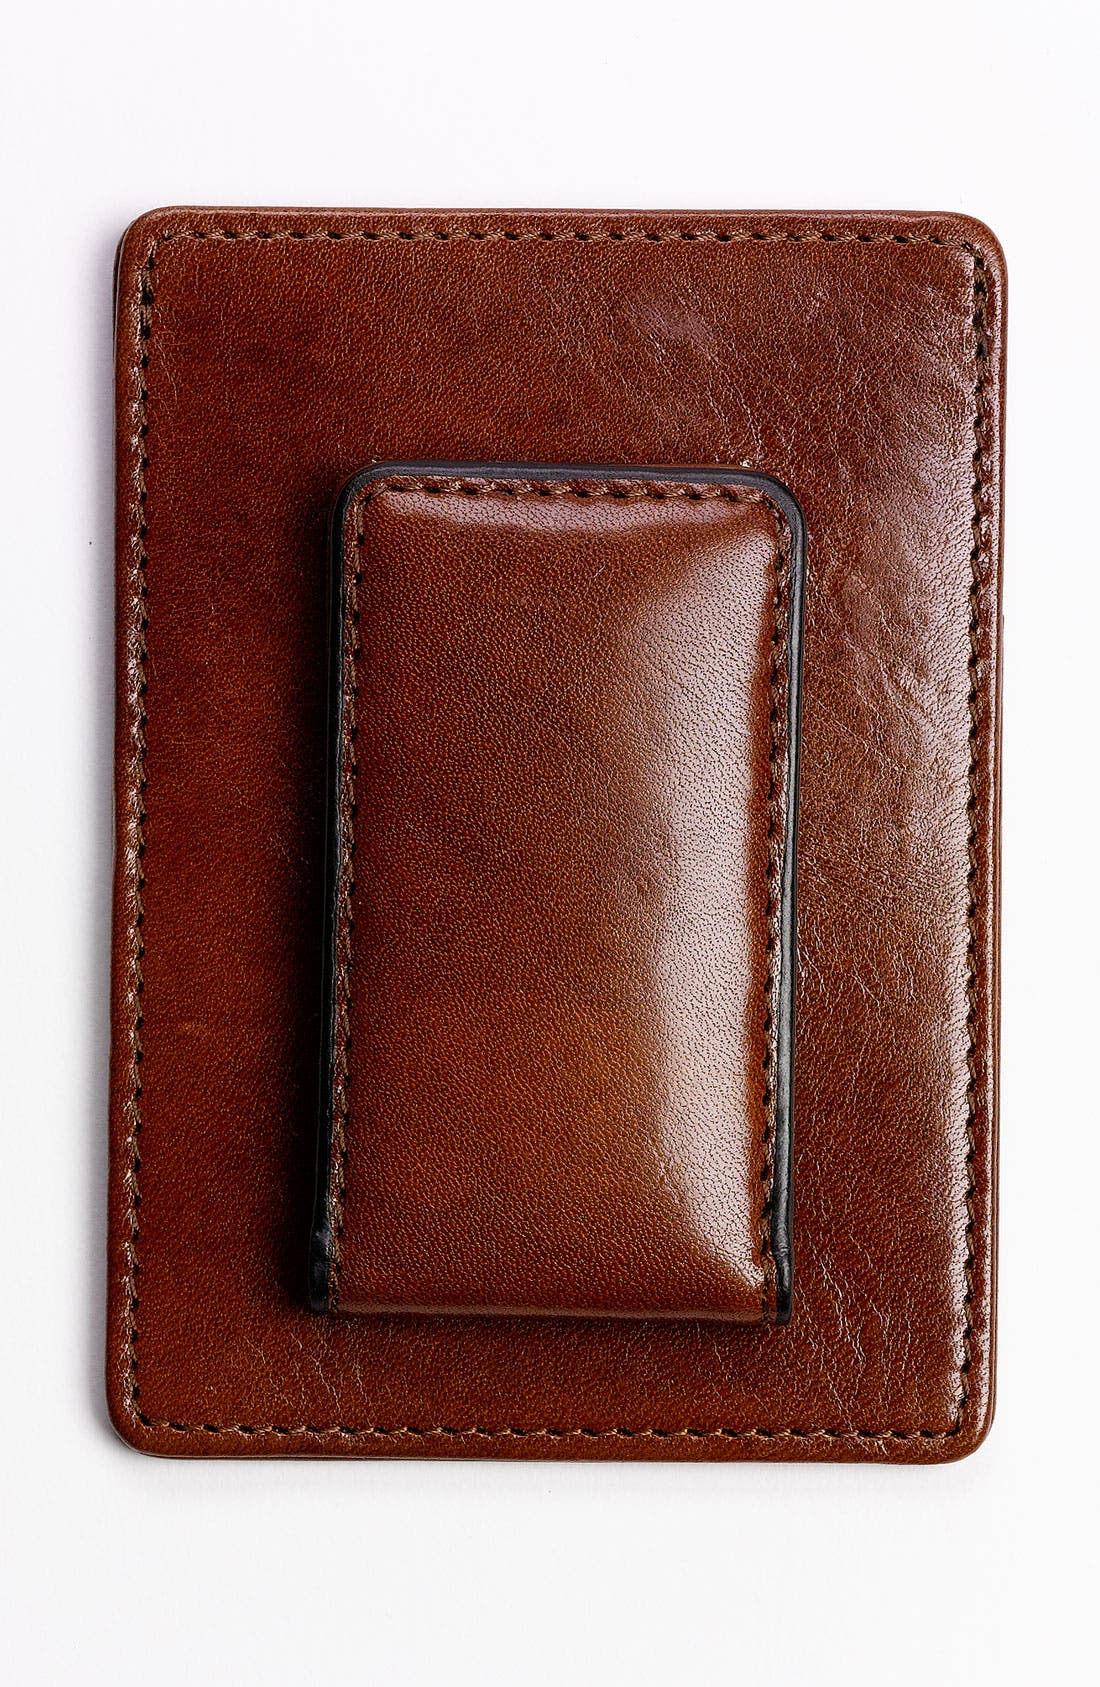 'Old Leather' Front Pocket Wallet,                             Alternate thumbnail 2, color,                             AMBER